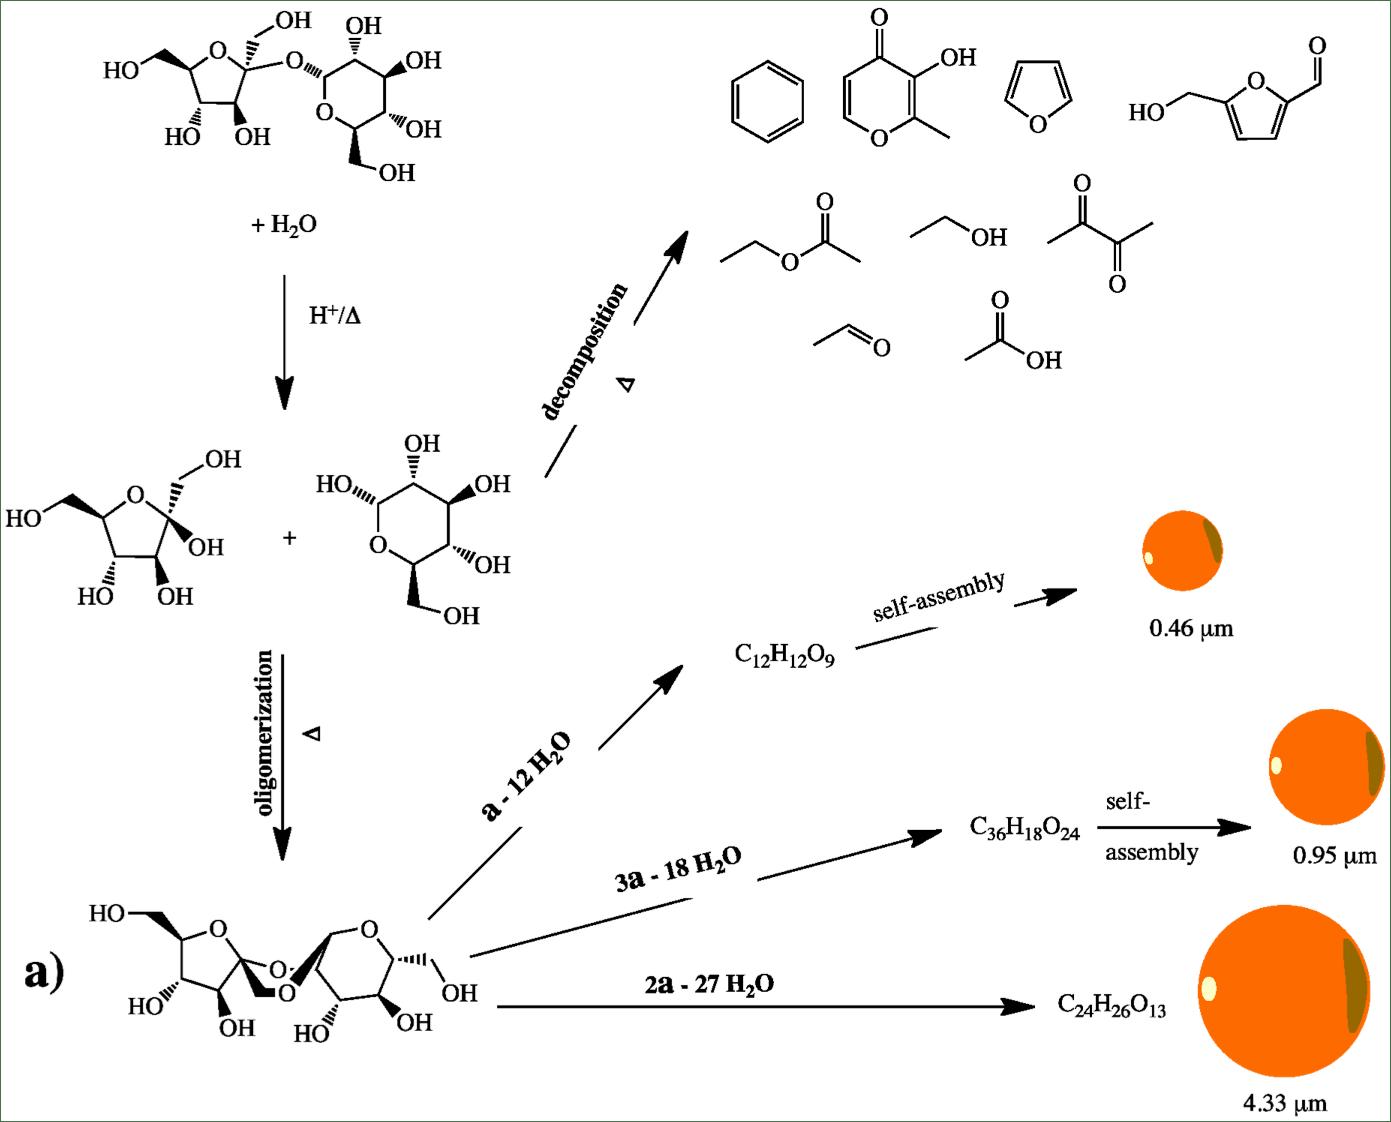 Intermolecular Bonds